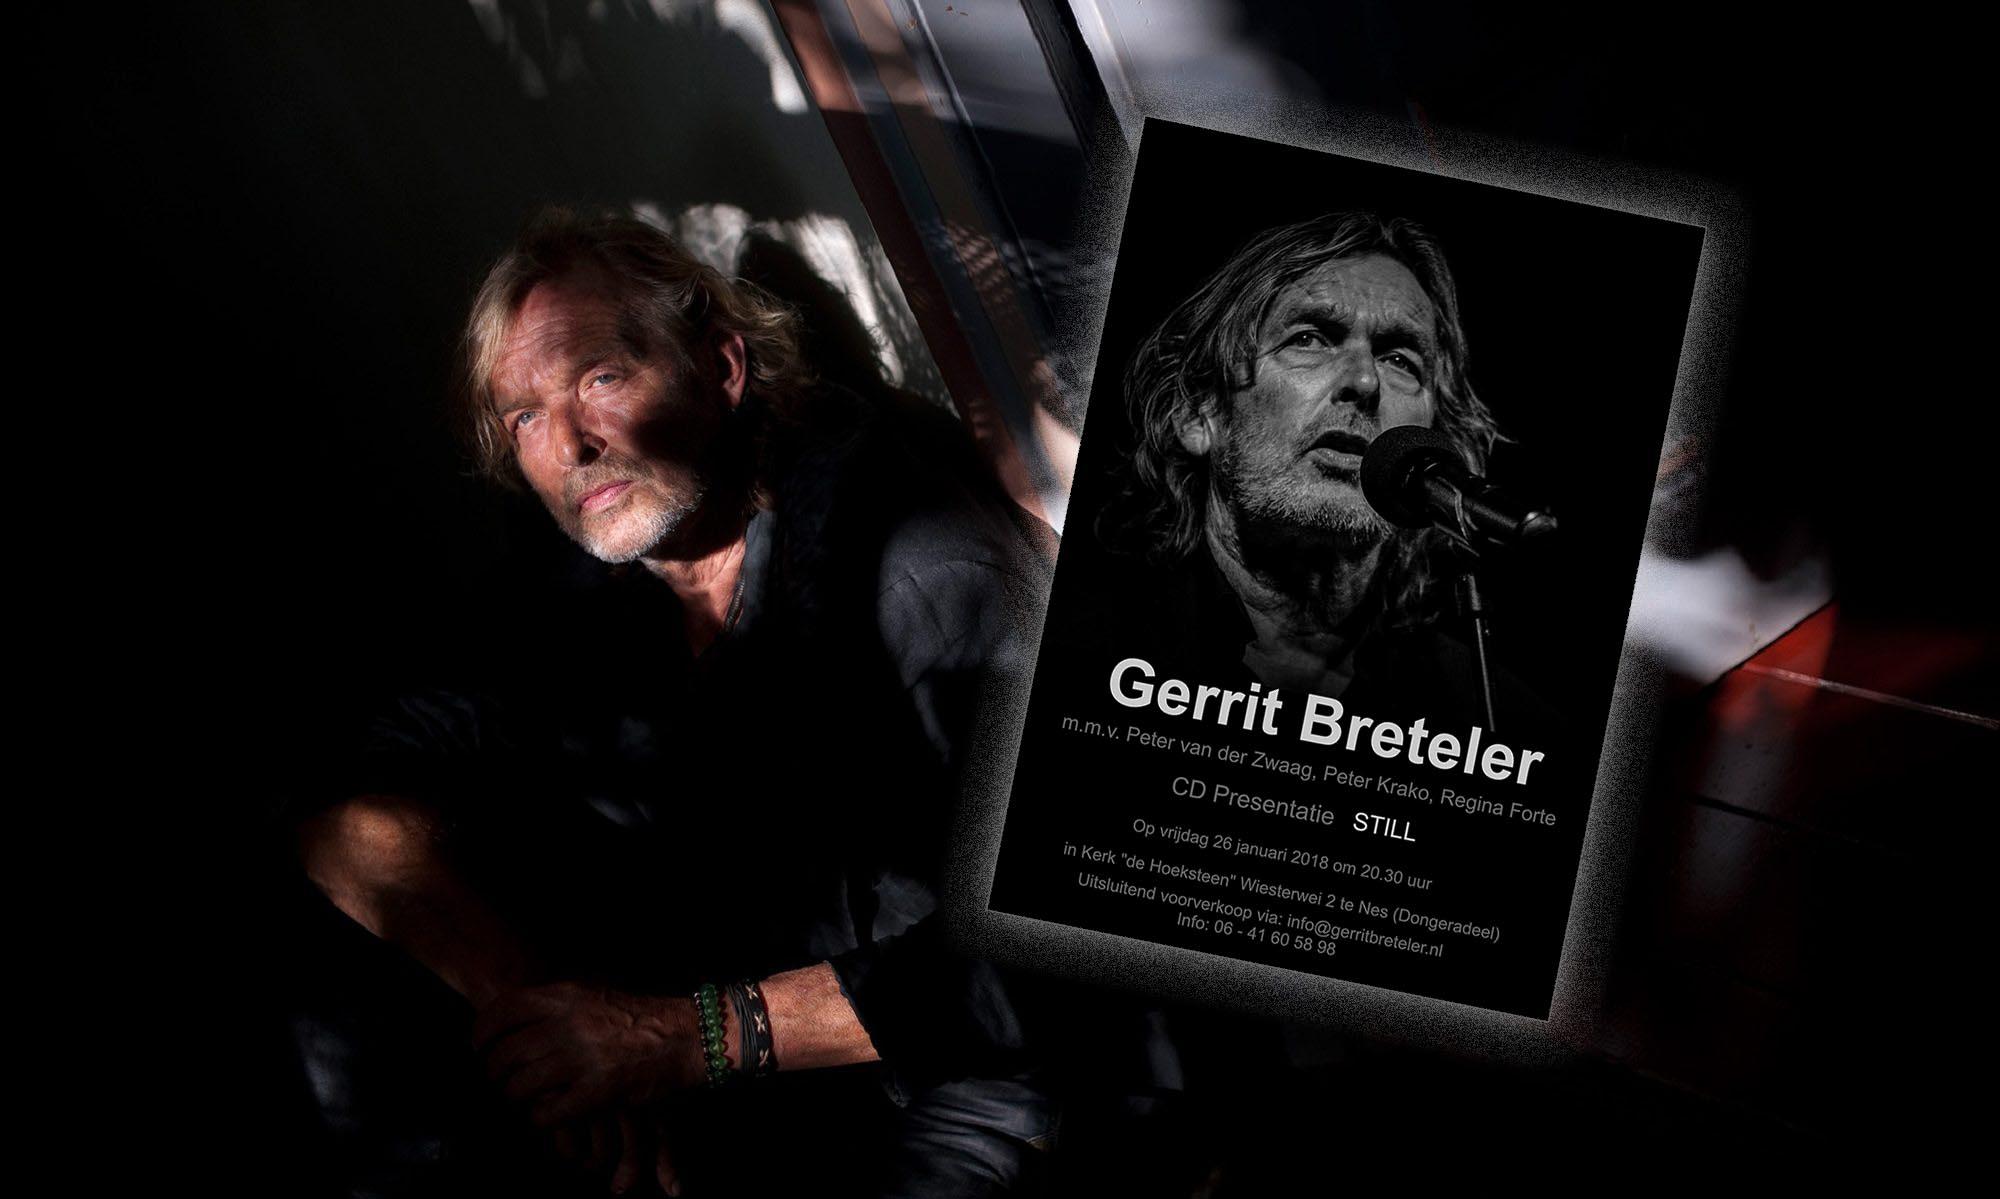 Gerrit Breteler